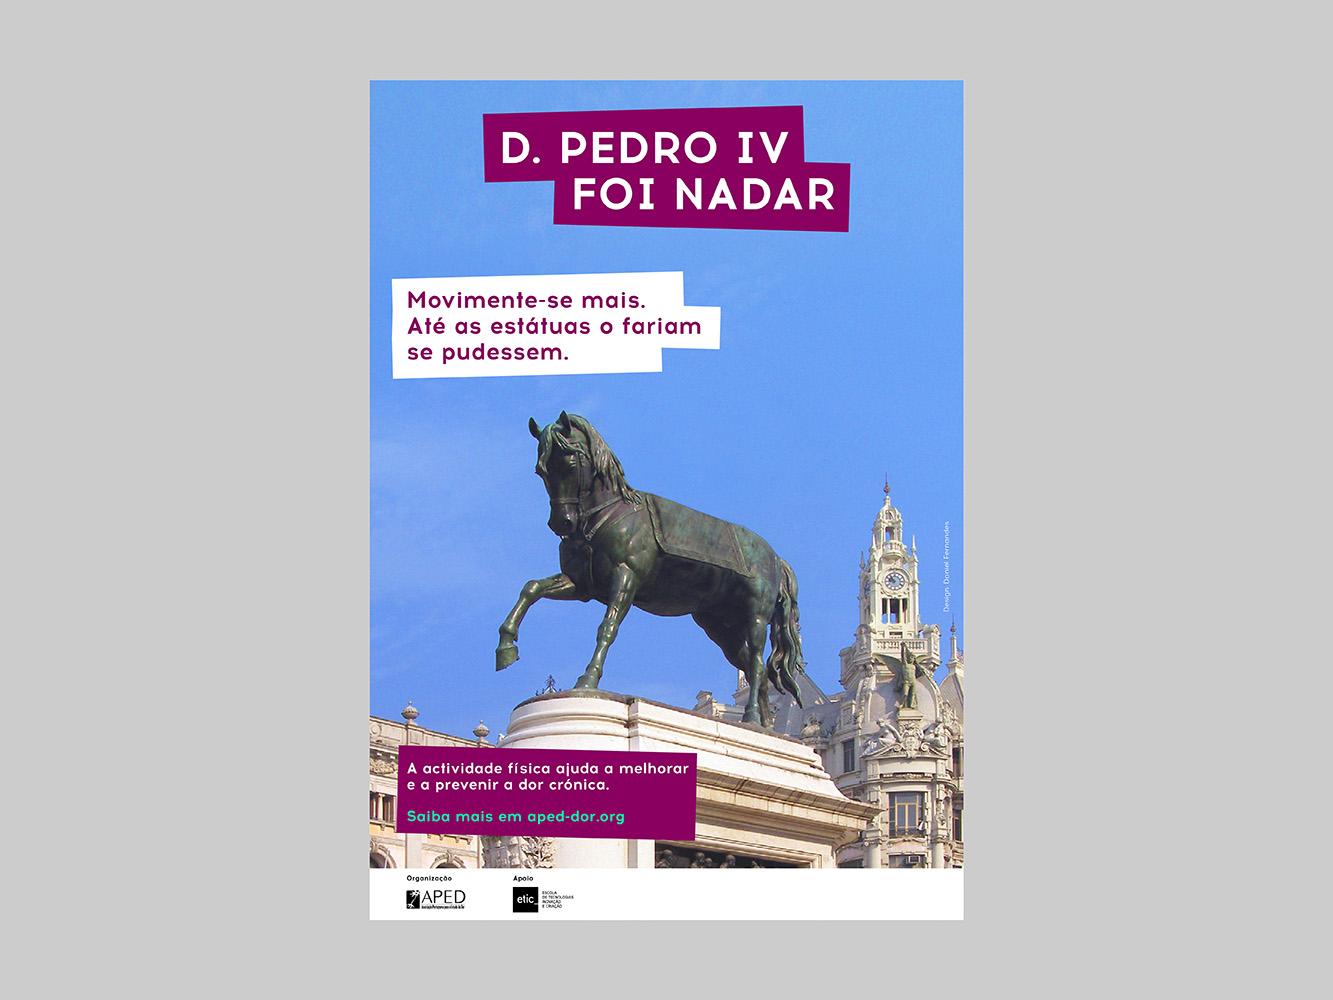 D. Pedro IV, Porto